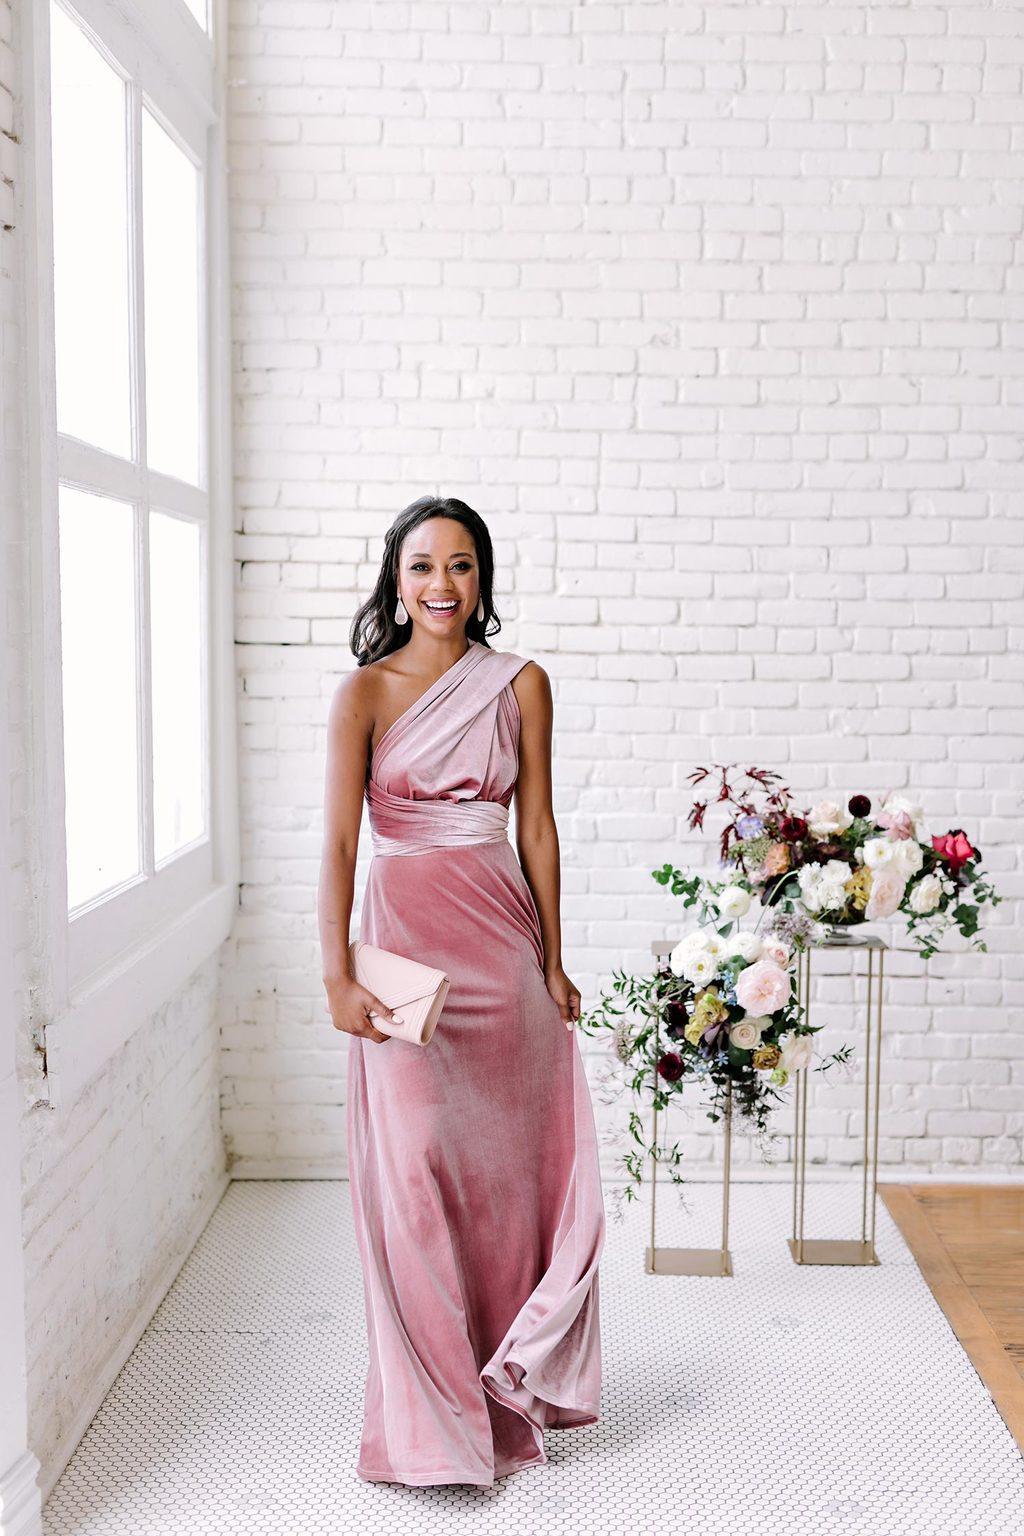 one-shoulder velvet bridesmaid dress with bubblegum pink hue